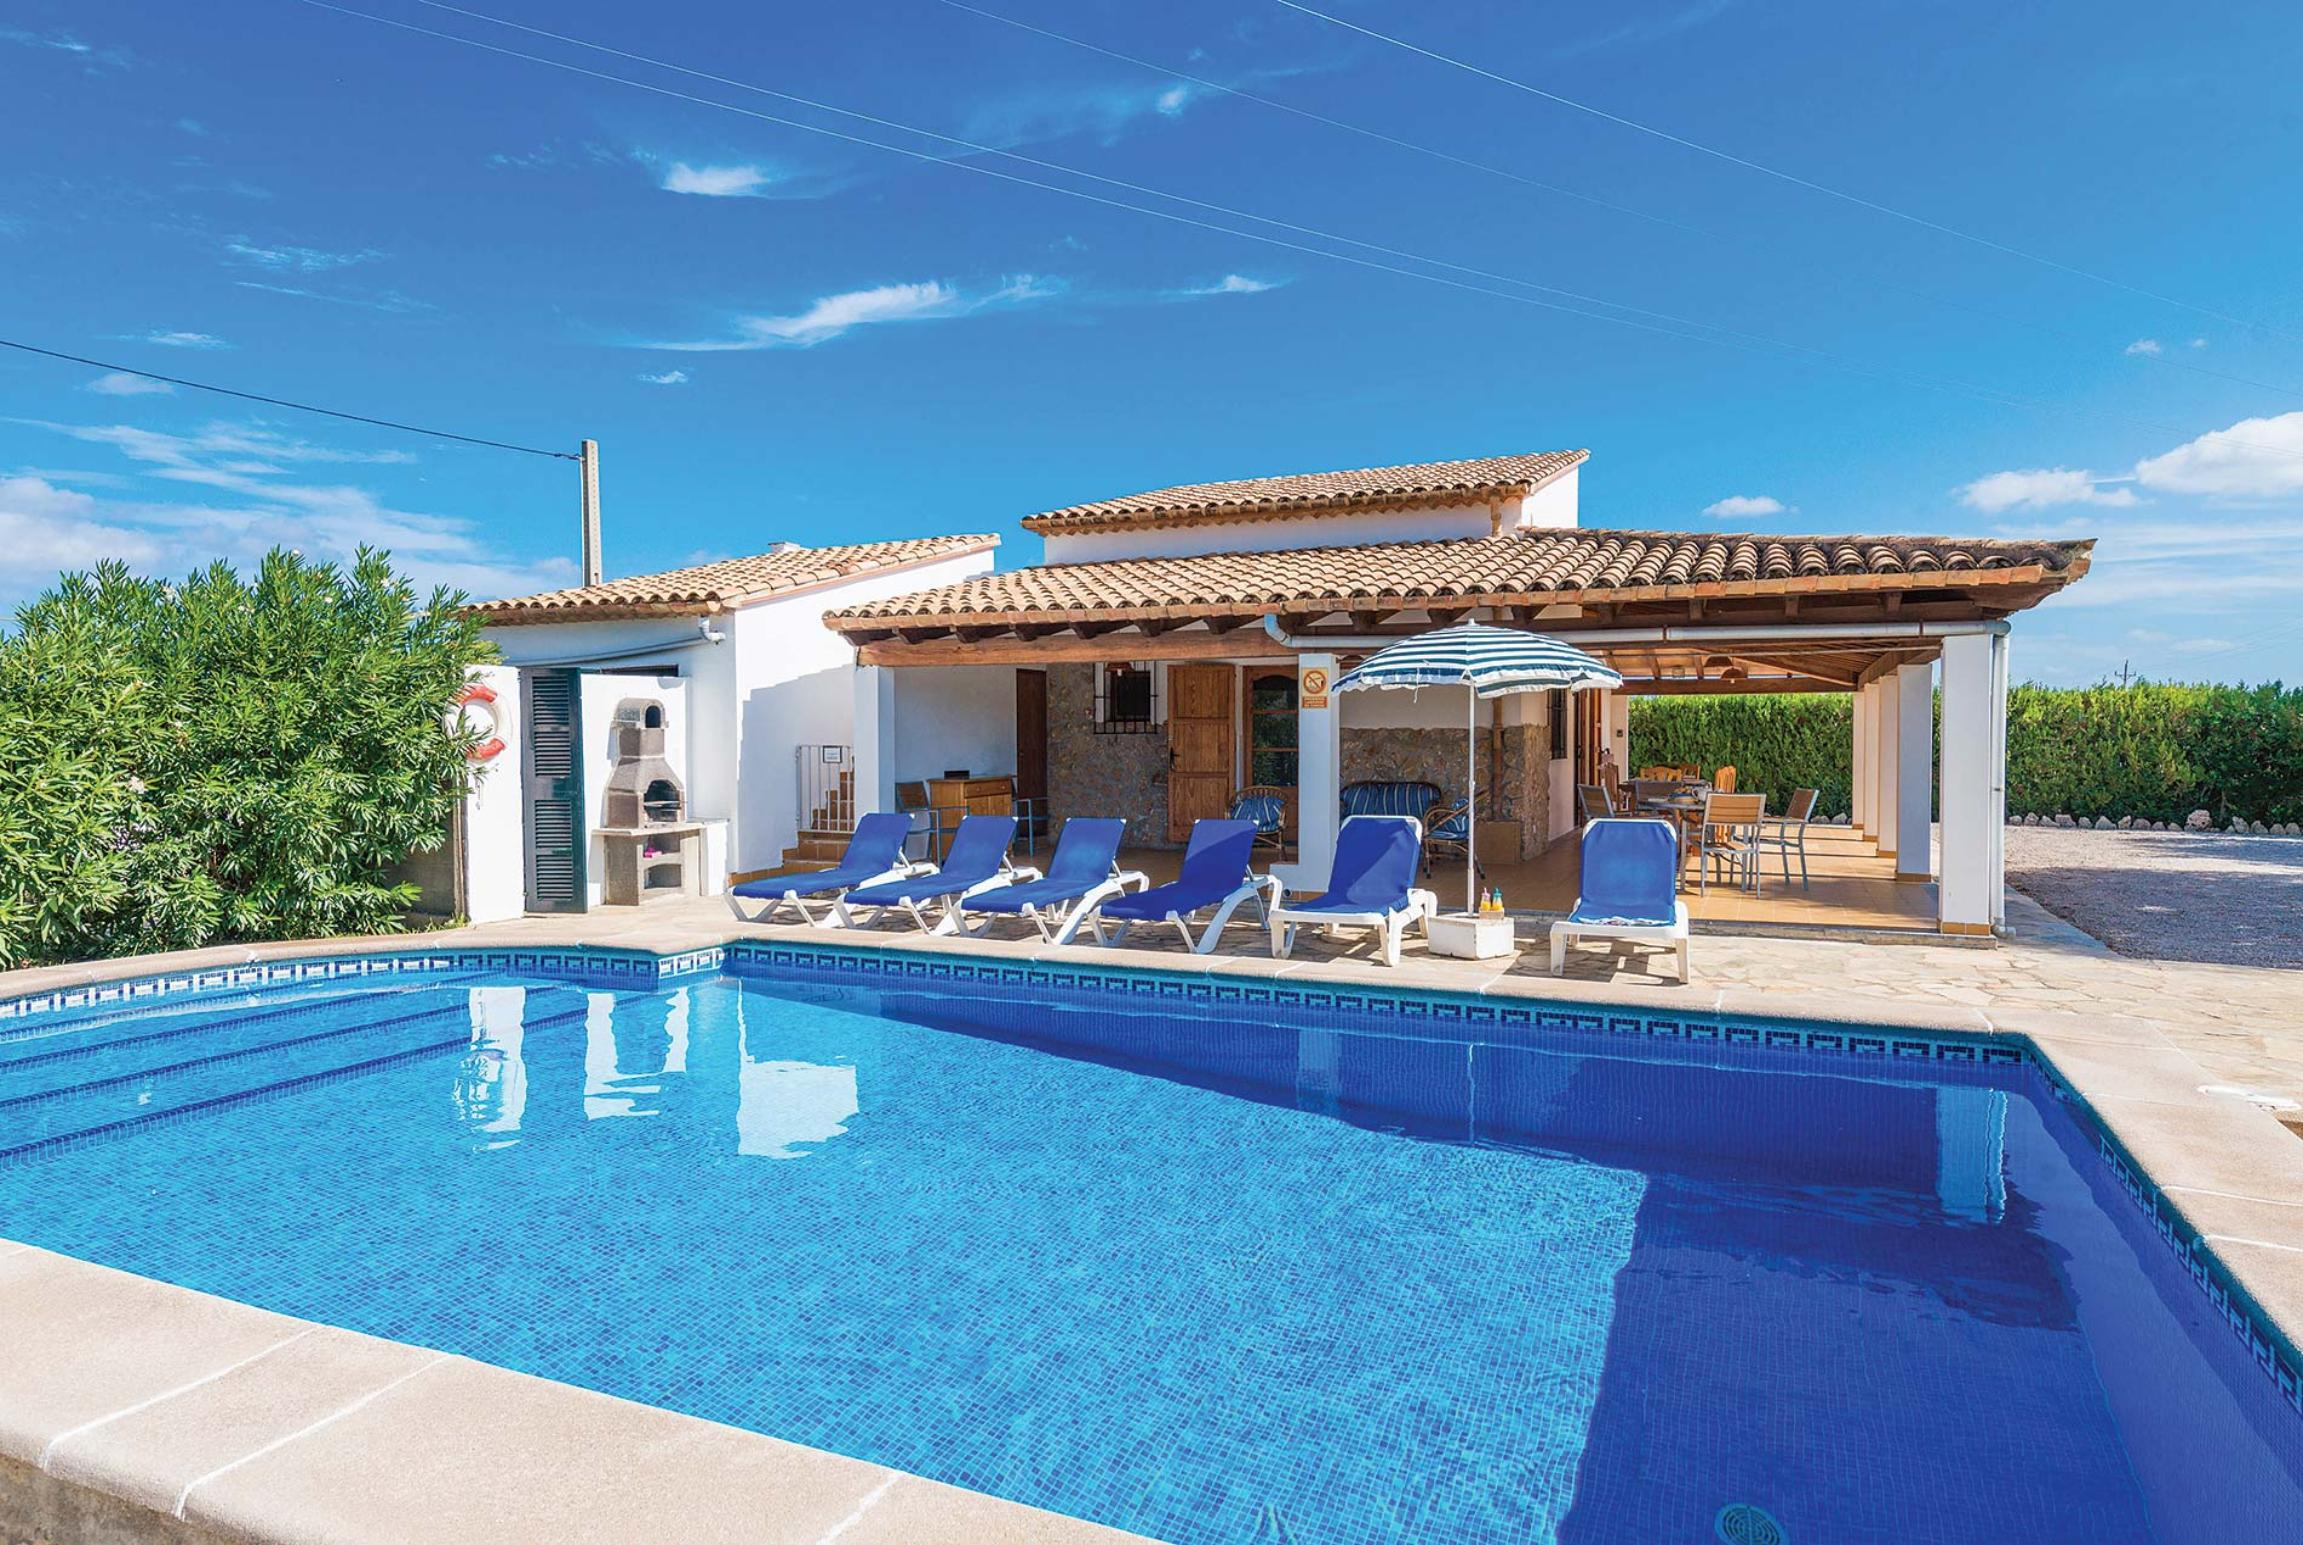 Ferienhaus Rasca (2654350), Formentor, Mallorca, Balearische Inseln, Spanien, Bild 4